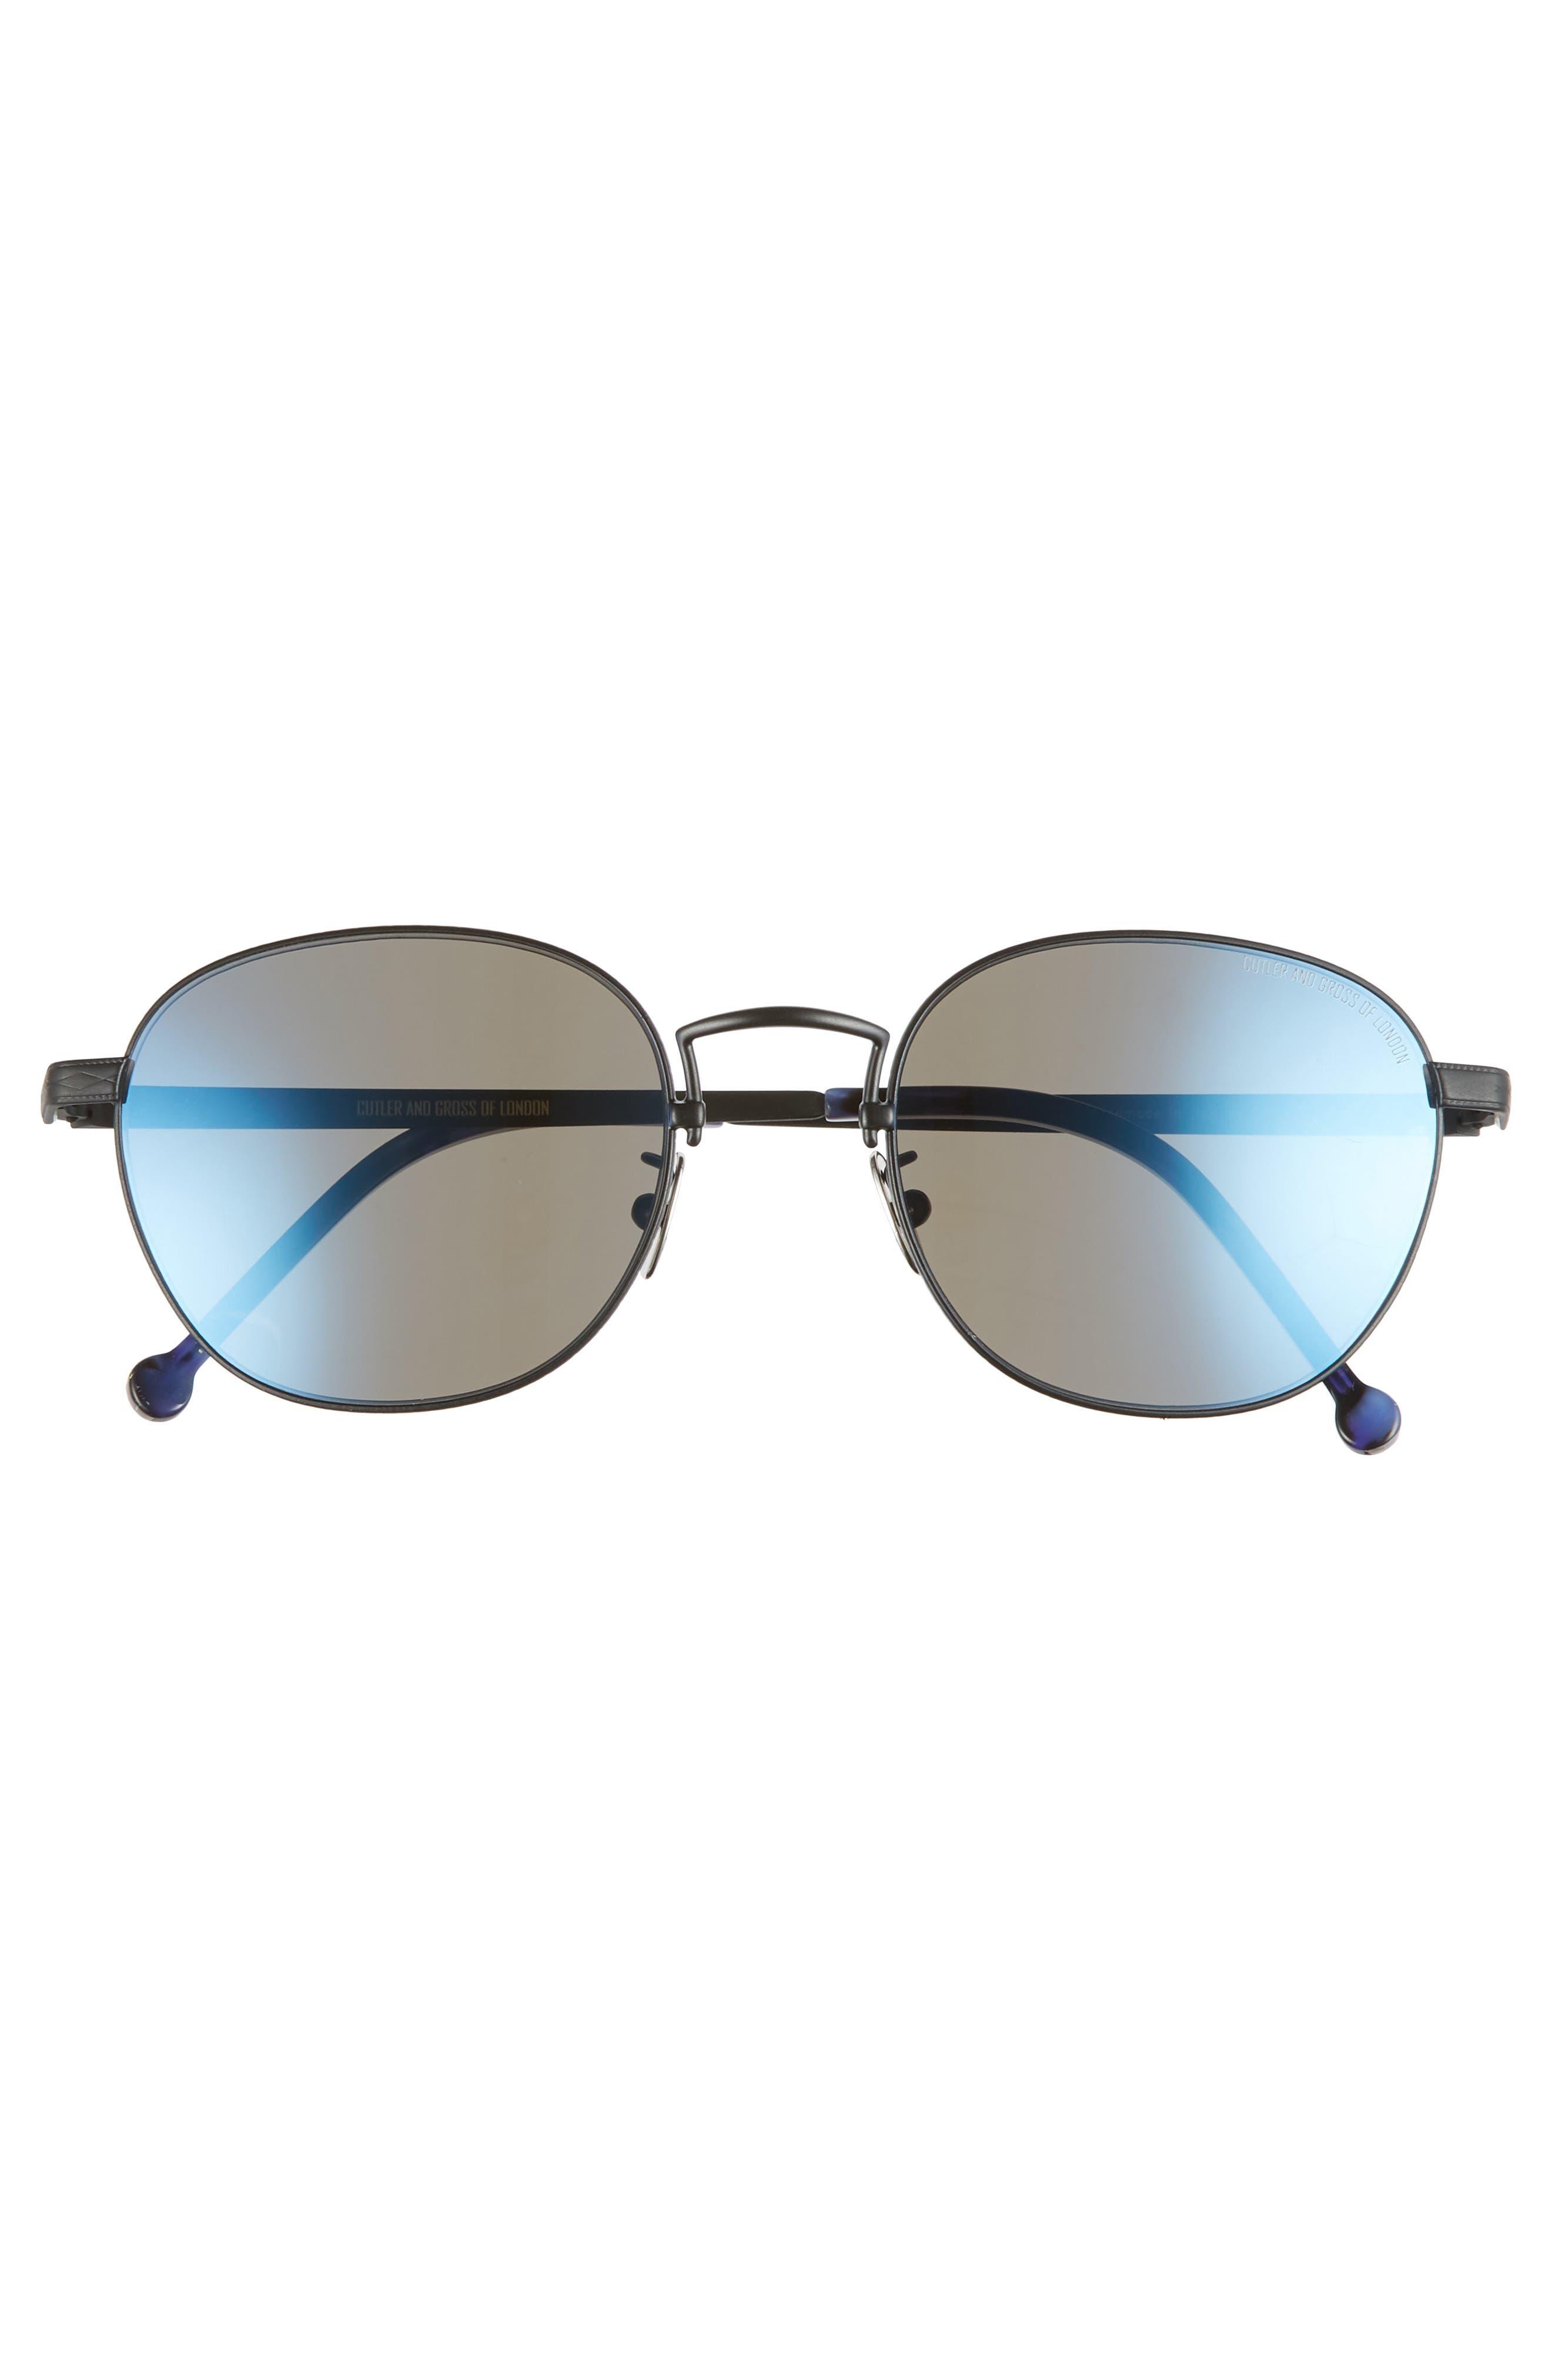 52mm Polarized Round Sunglasses,                             Alternate thumbnail 2, color,                             SATIN PALLADIUM/ BLUE